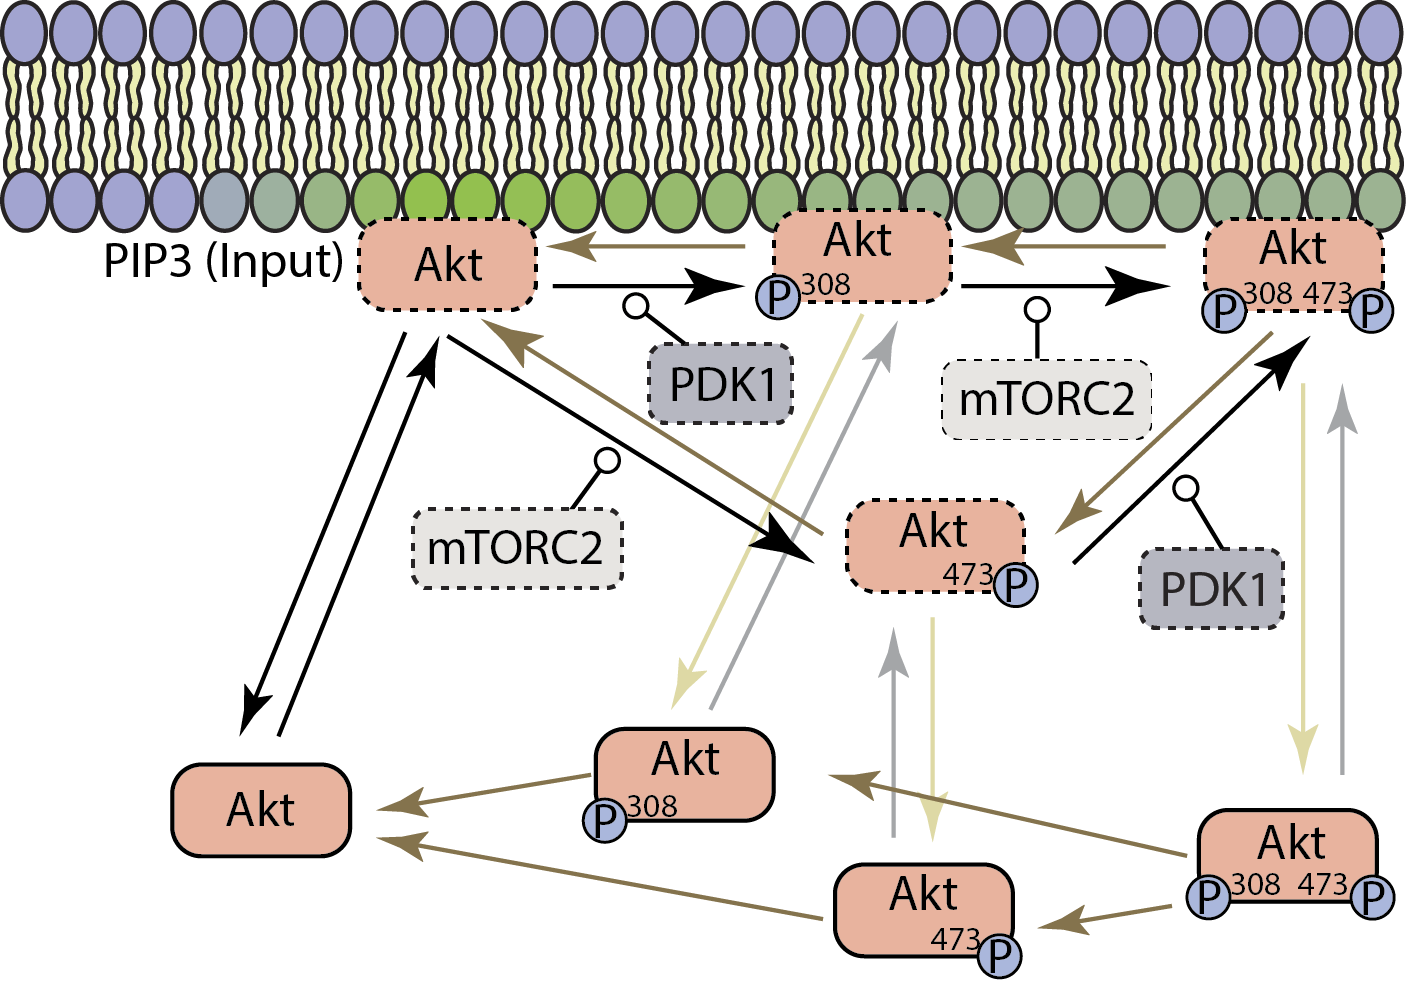 Figure_1_Dynamic_Modelling.png